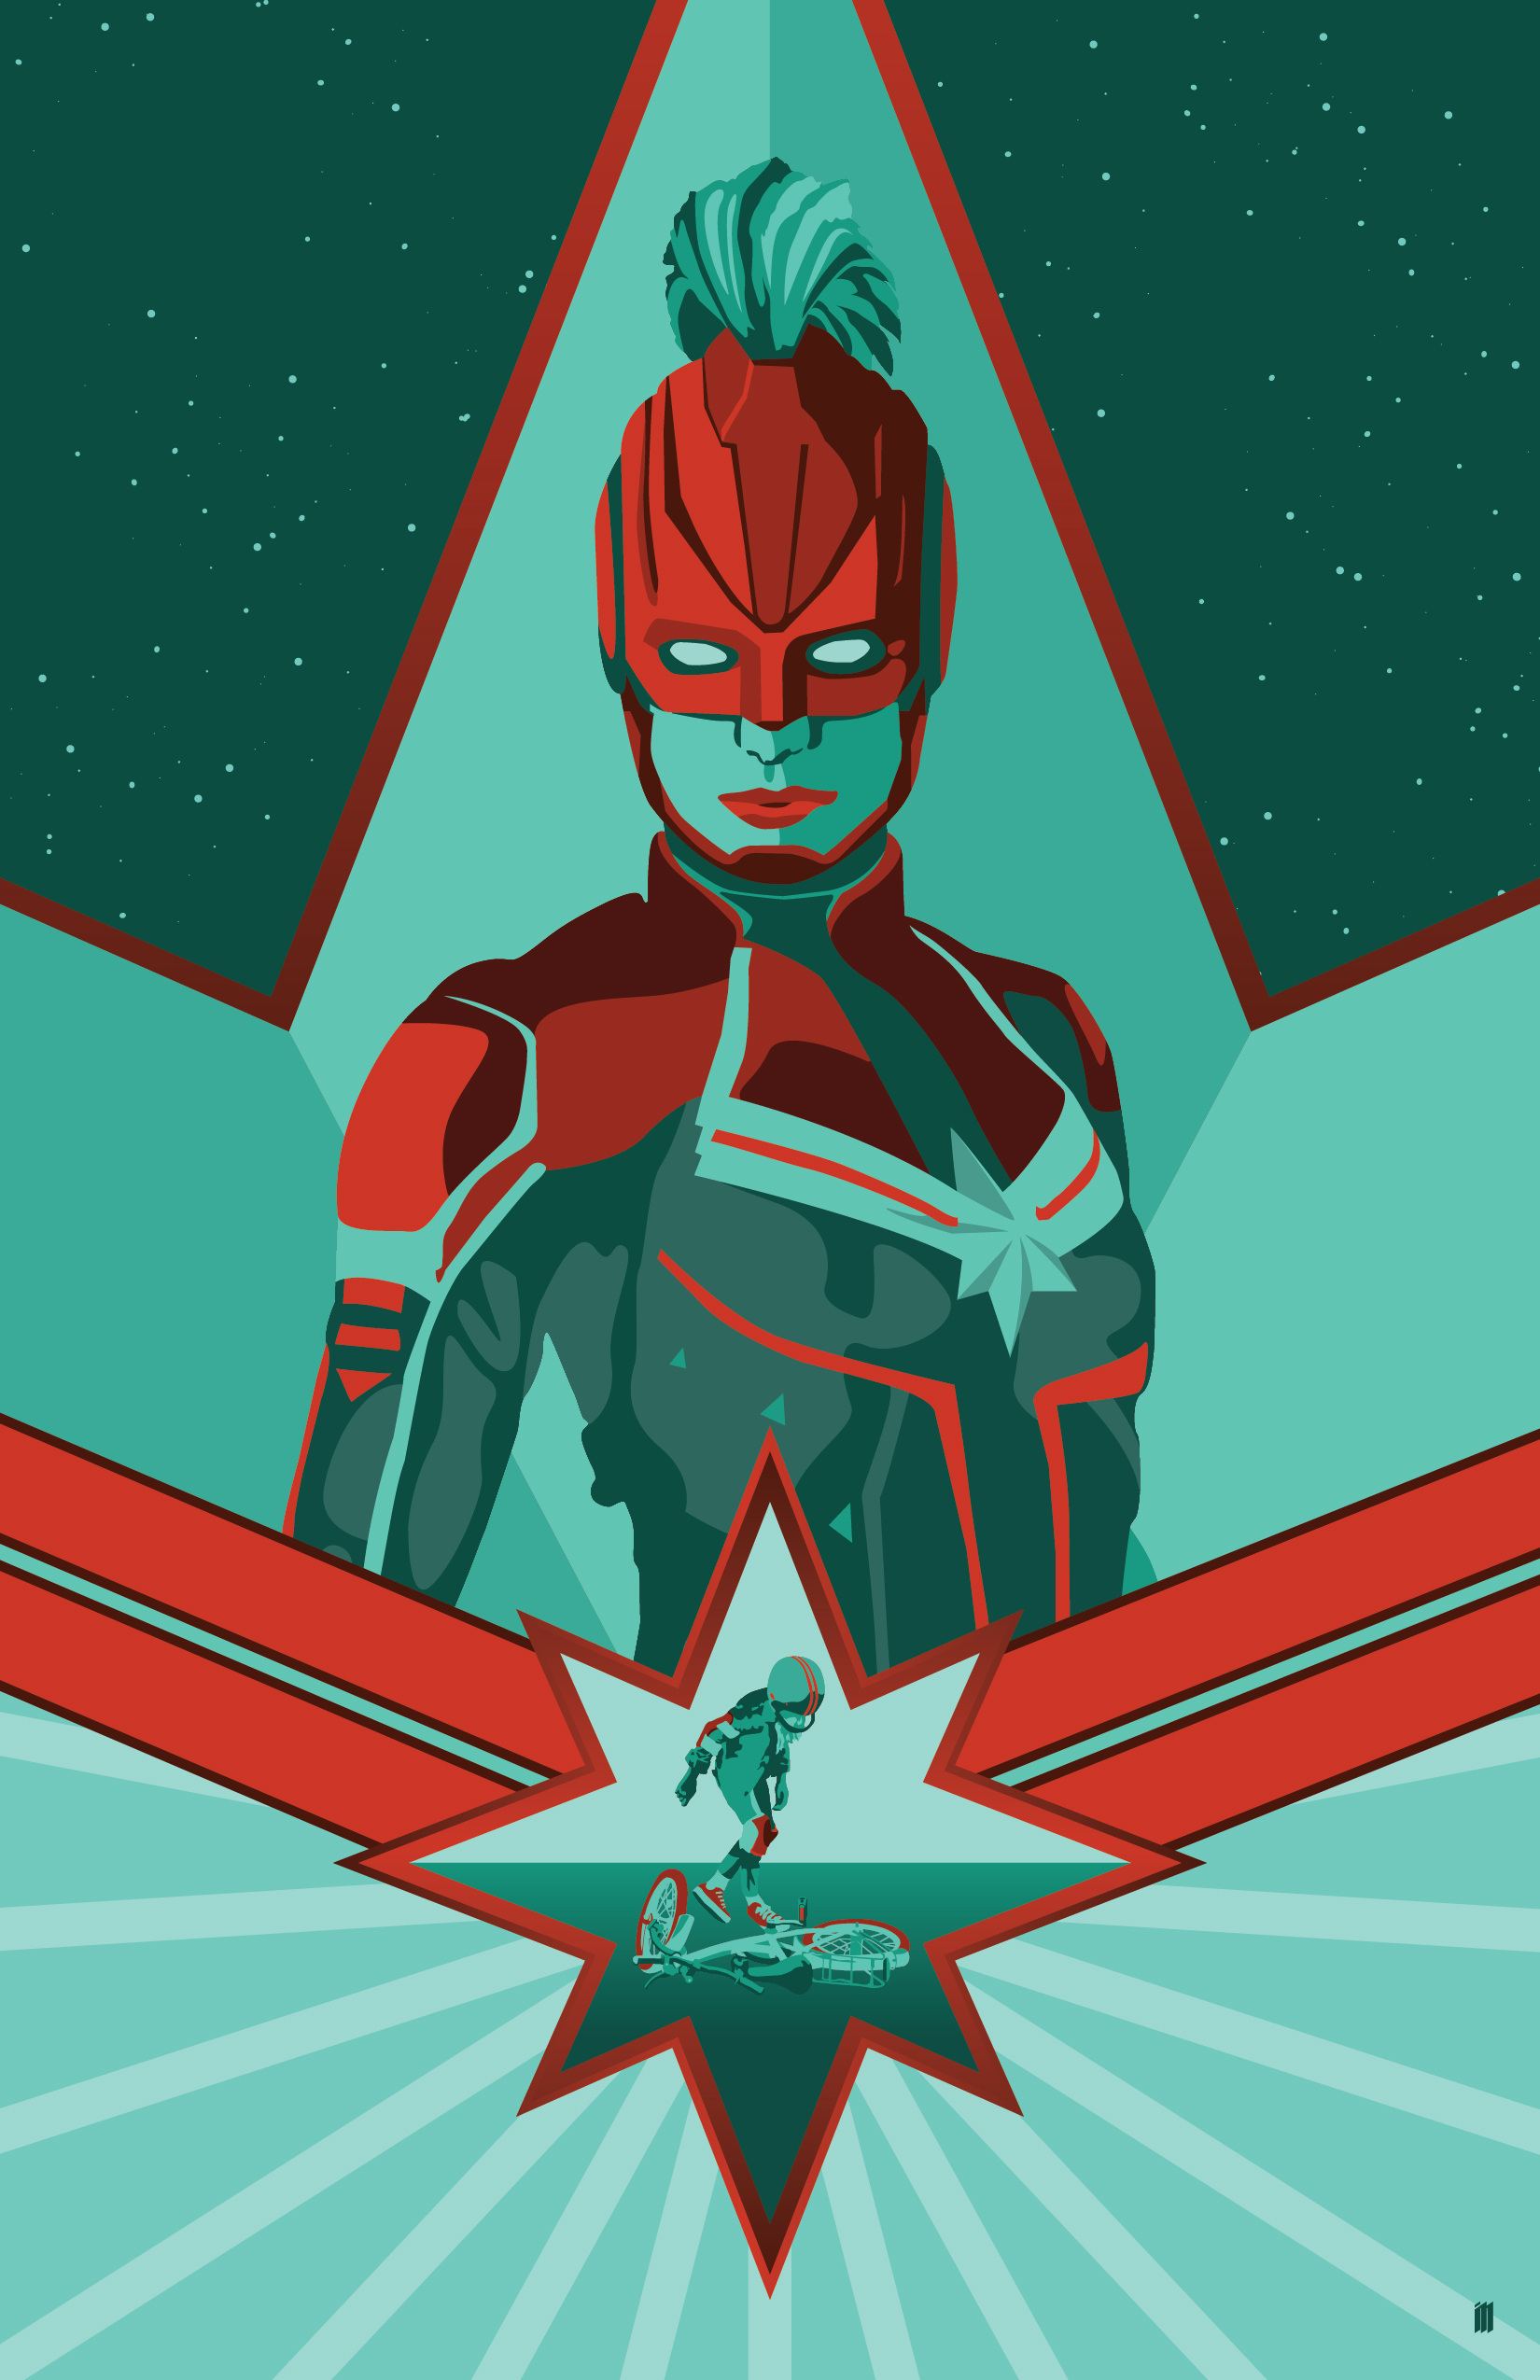 Captain_Marvel_Ian_Maxfield.jpg